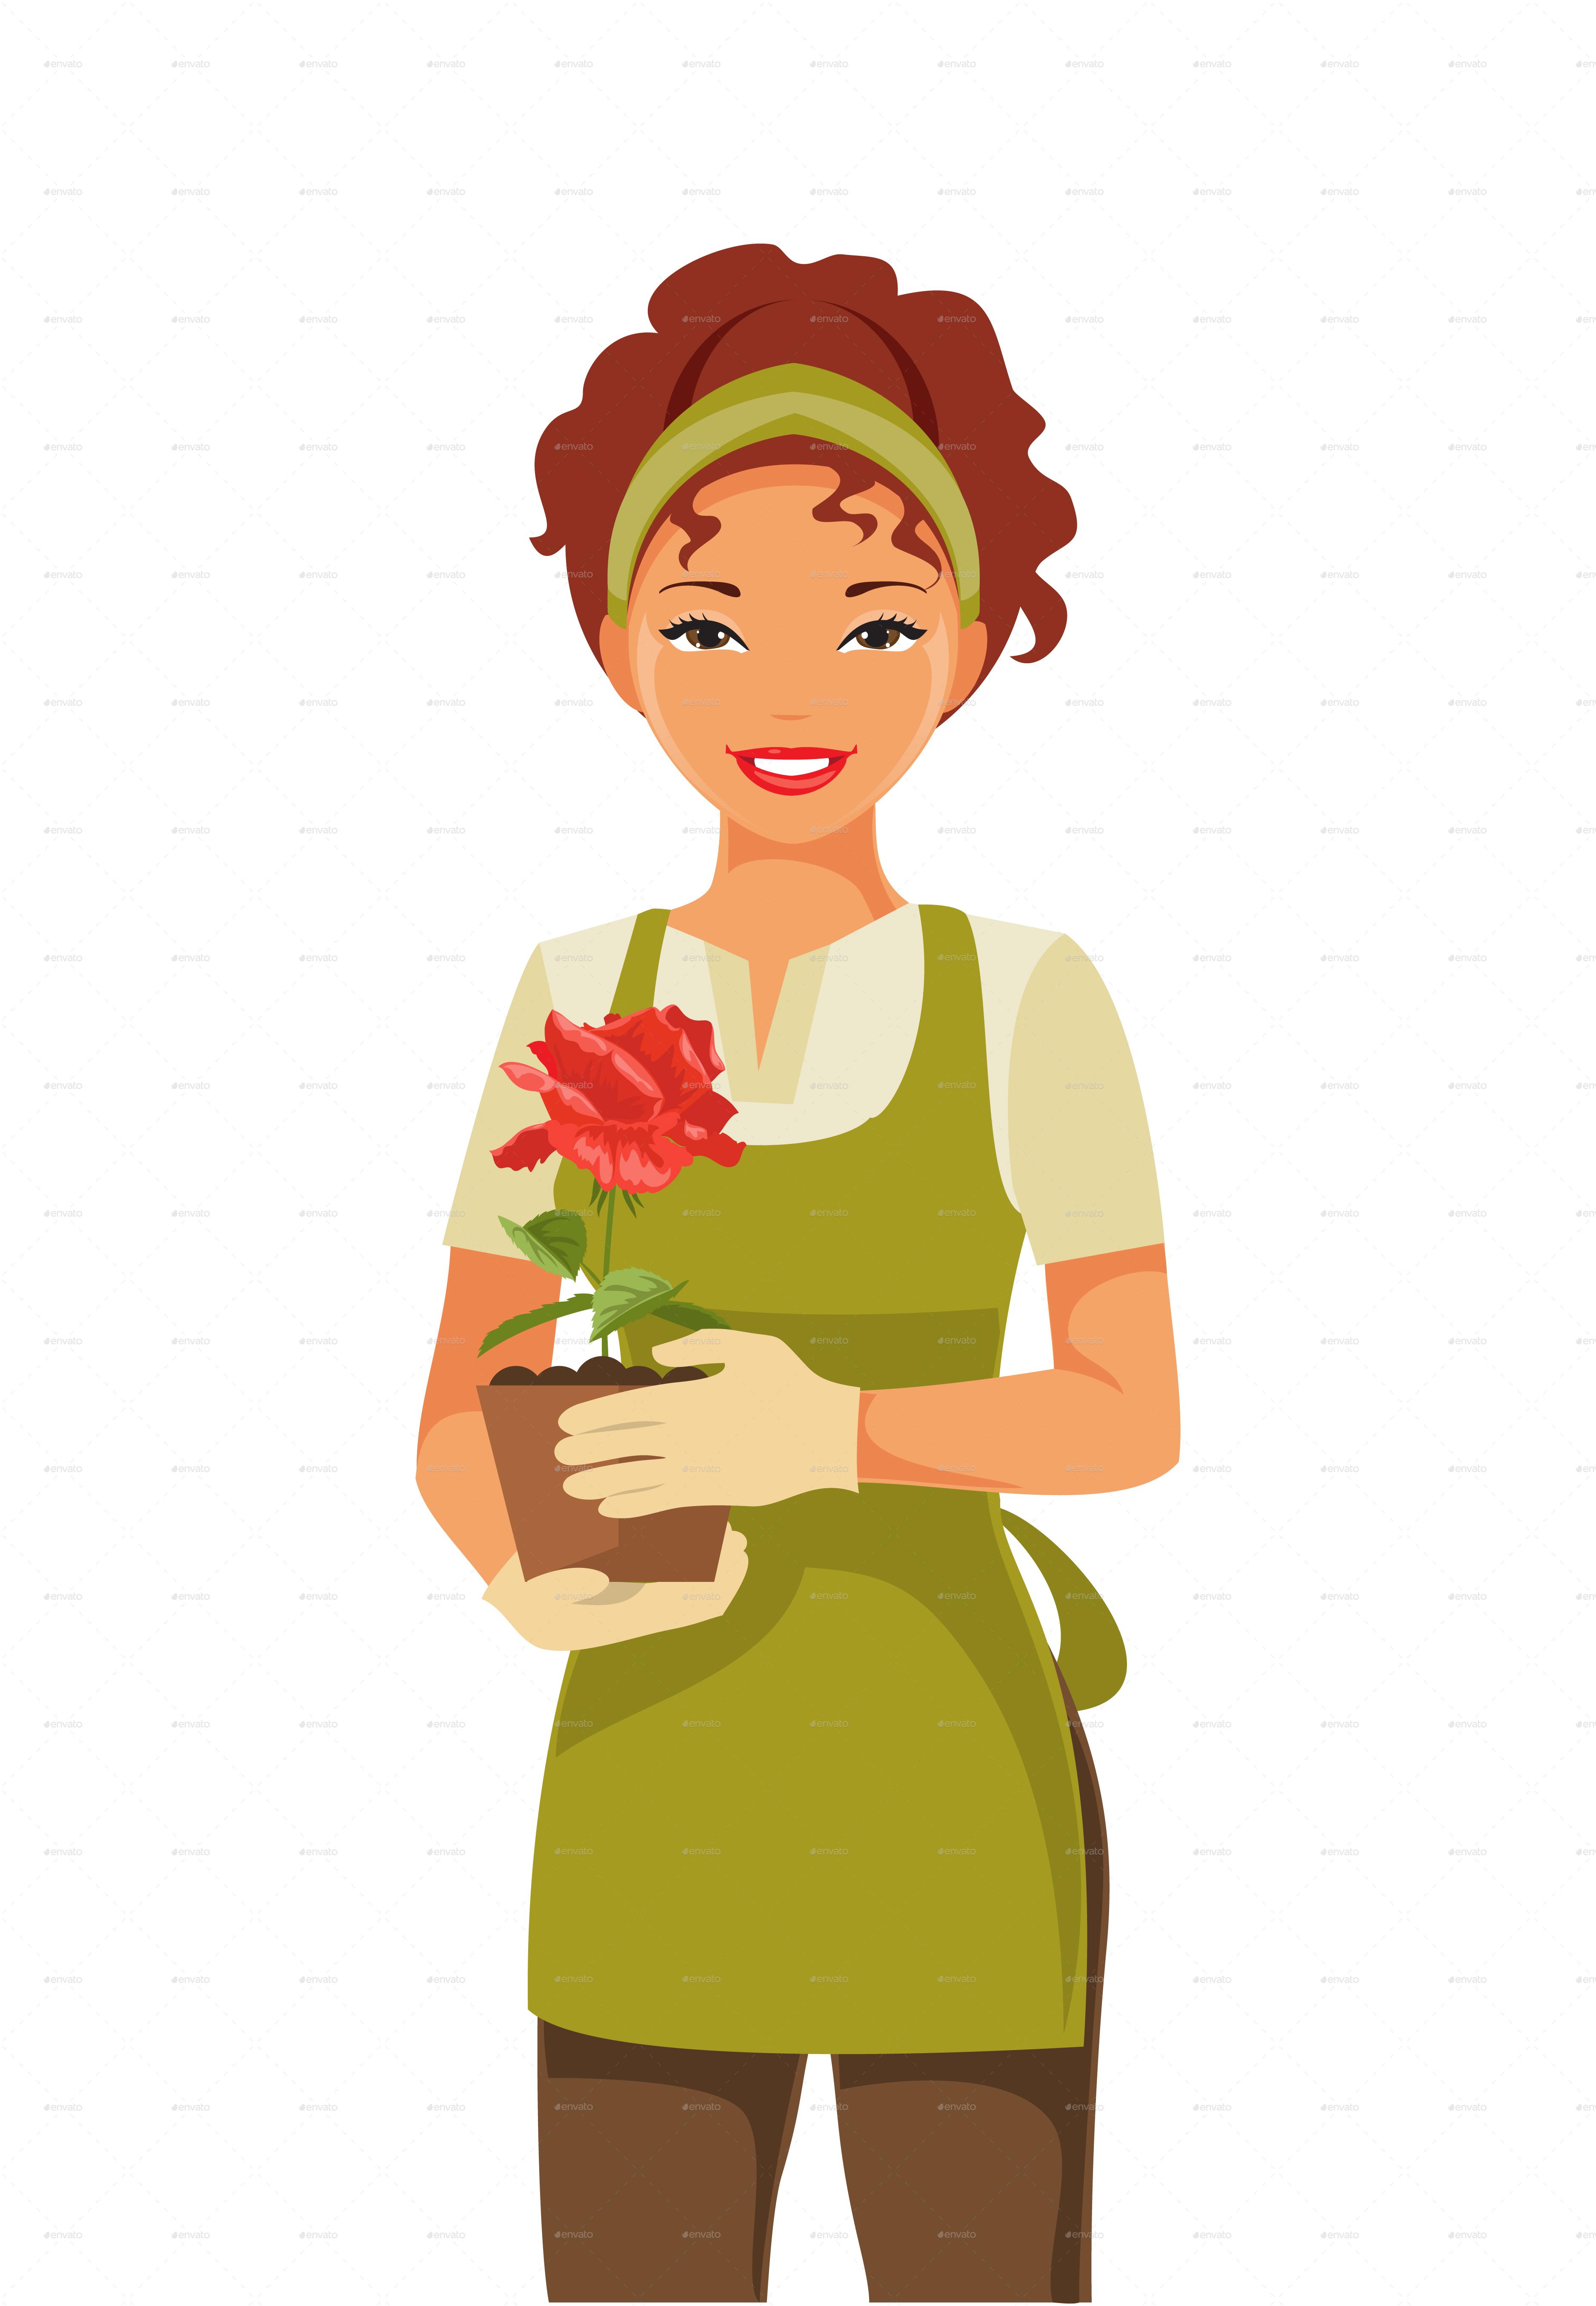 Gardener clipart lady gardener. Woman